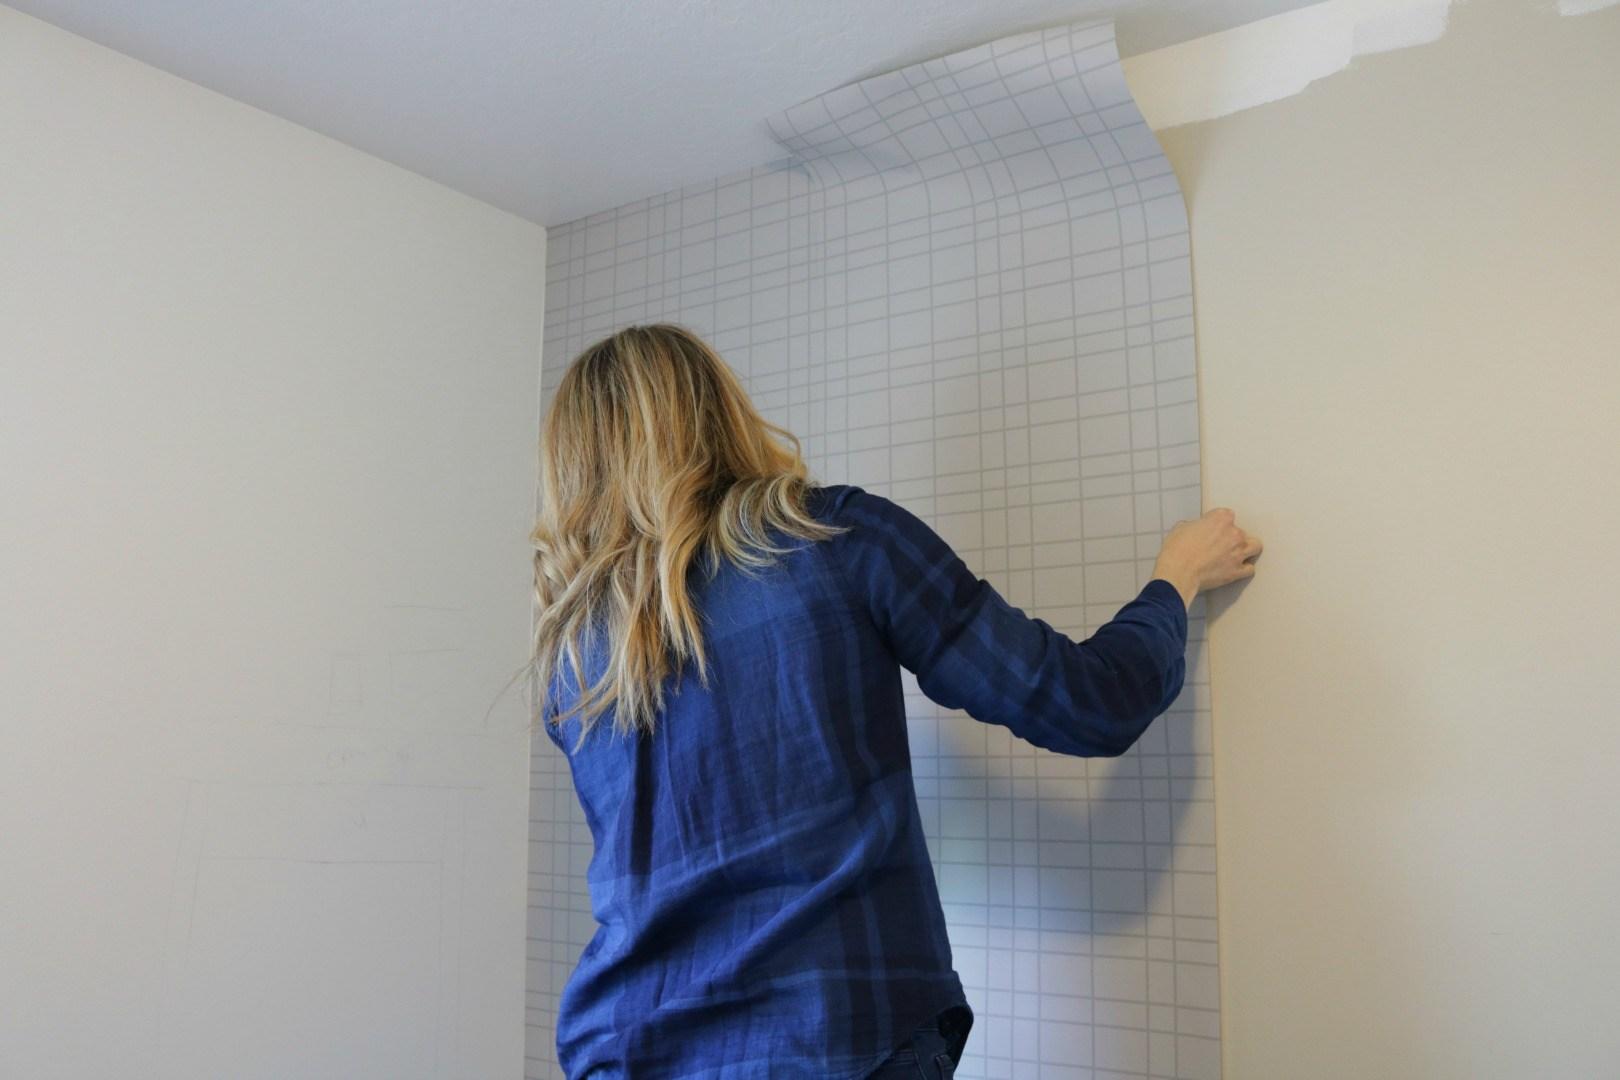 Menempel Wallpaper - Urutan Cara Memasang Wallpaper Dinding Agar Hasilnya Tahan Lama - nestingwithgrace.com